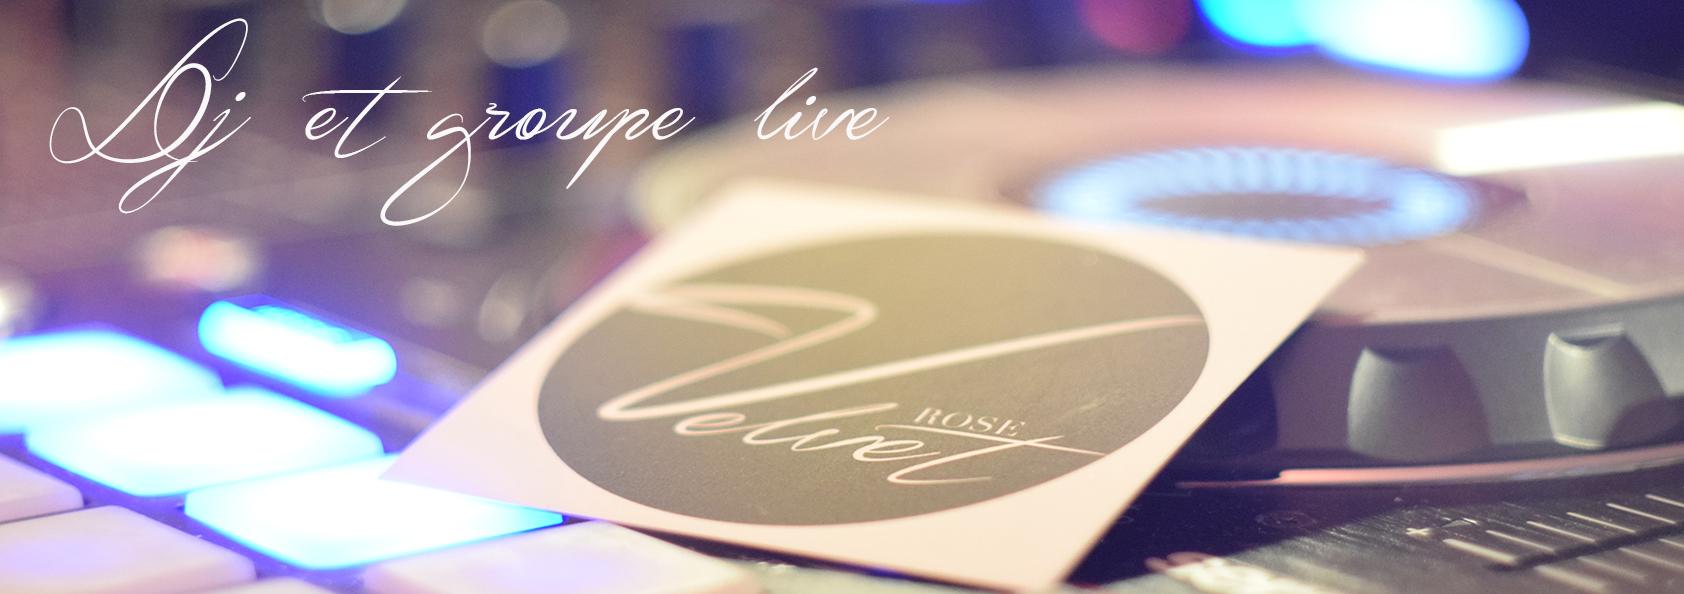 DJ-et-groupe-live